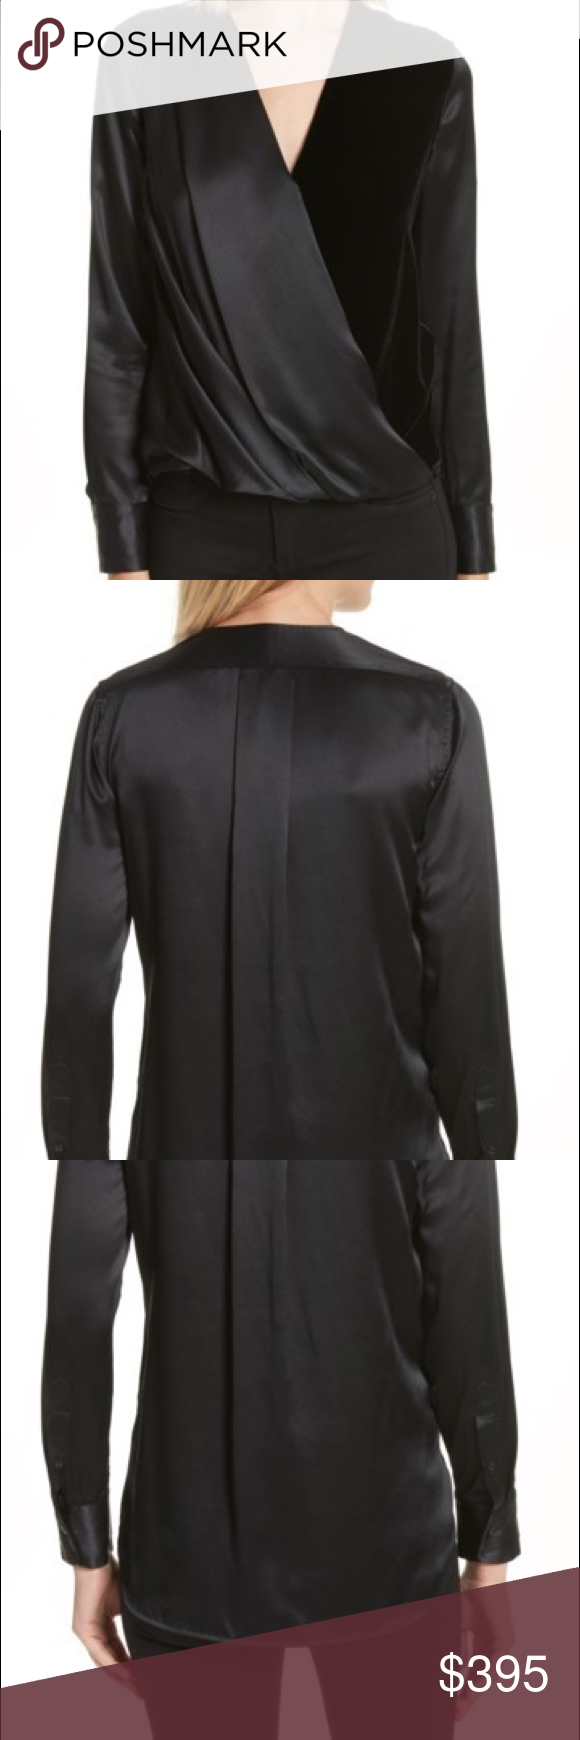 53474a17015db Rag  amp  Bone  Victor  Silk  amp  Velvet Blouse This drapey surplice top